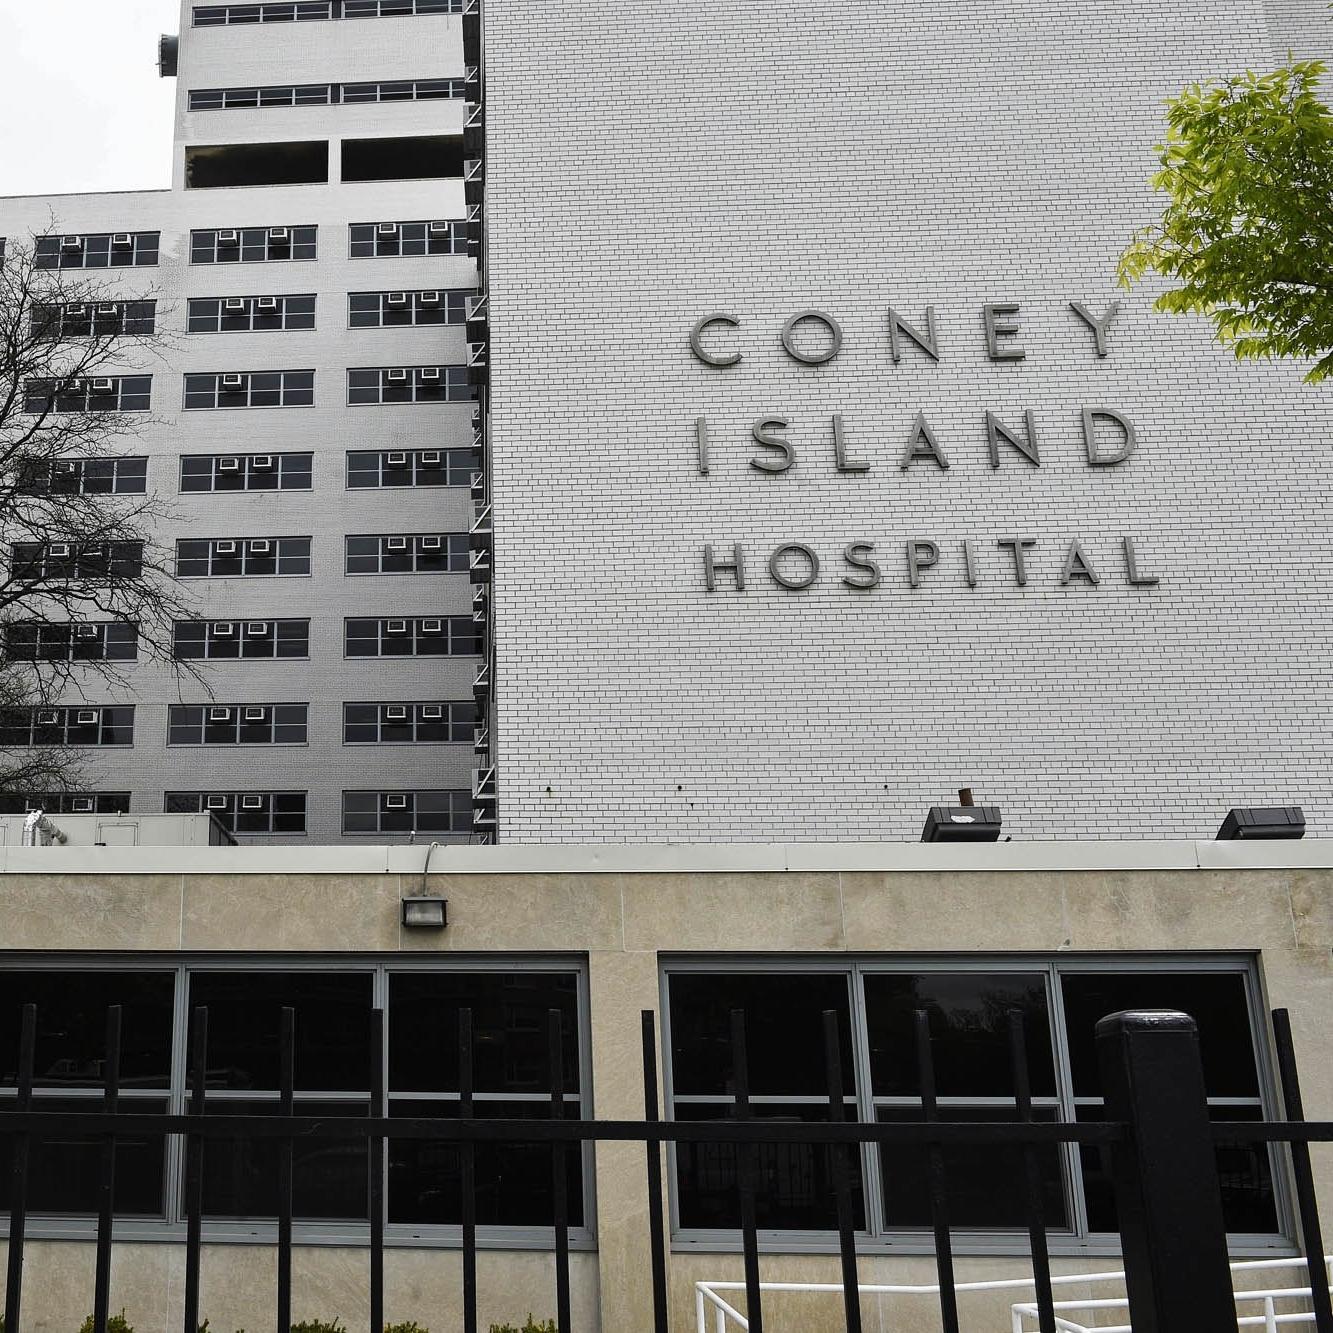 Coney Island Hospital Flood Migitation.jpg